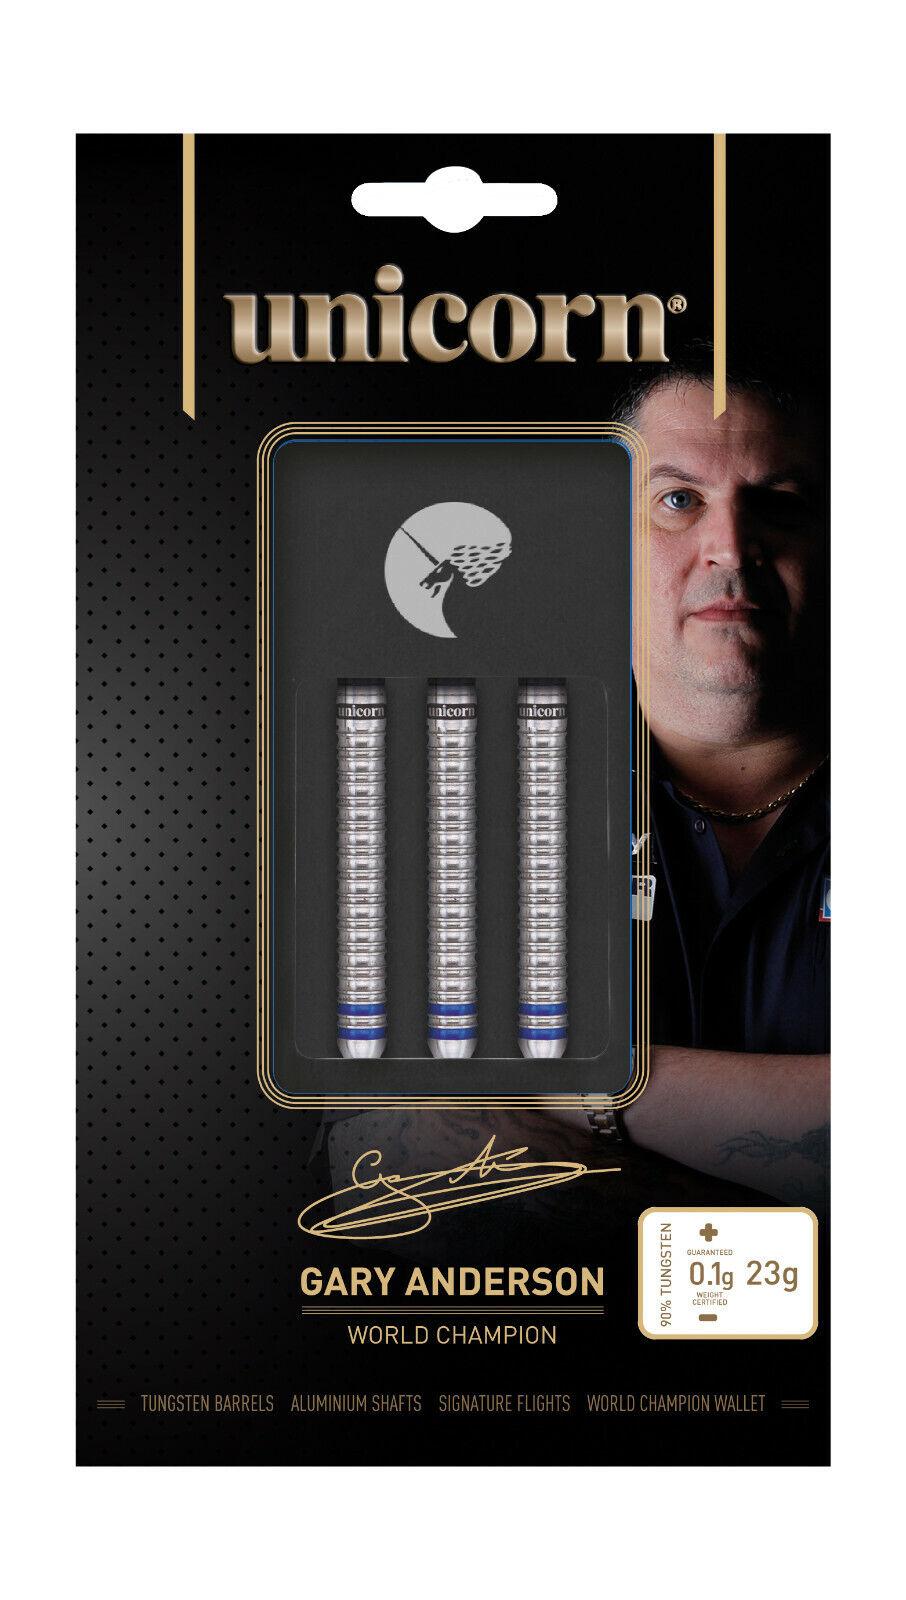 Unicorn Gary Anderson World Champion 25g Phase 3 Natural 90% Tungsten Darts Set